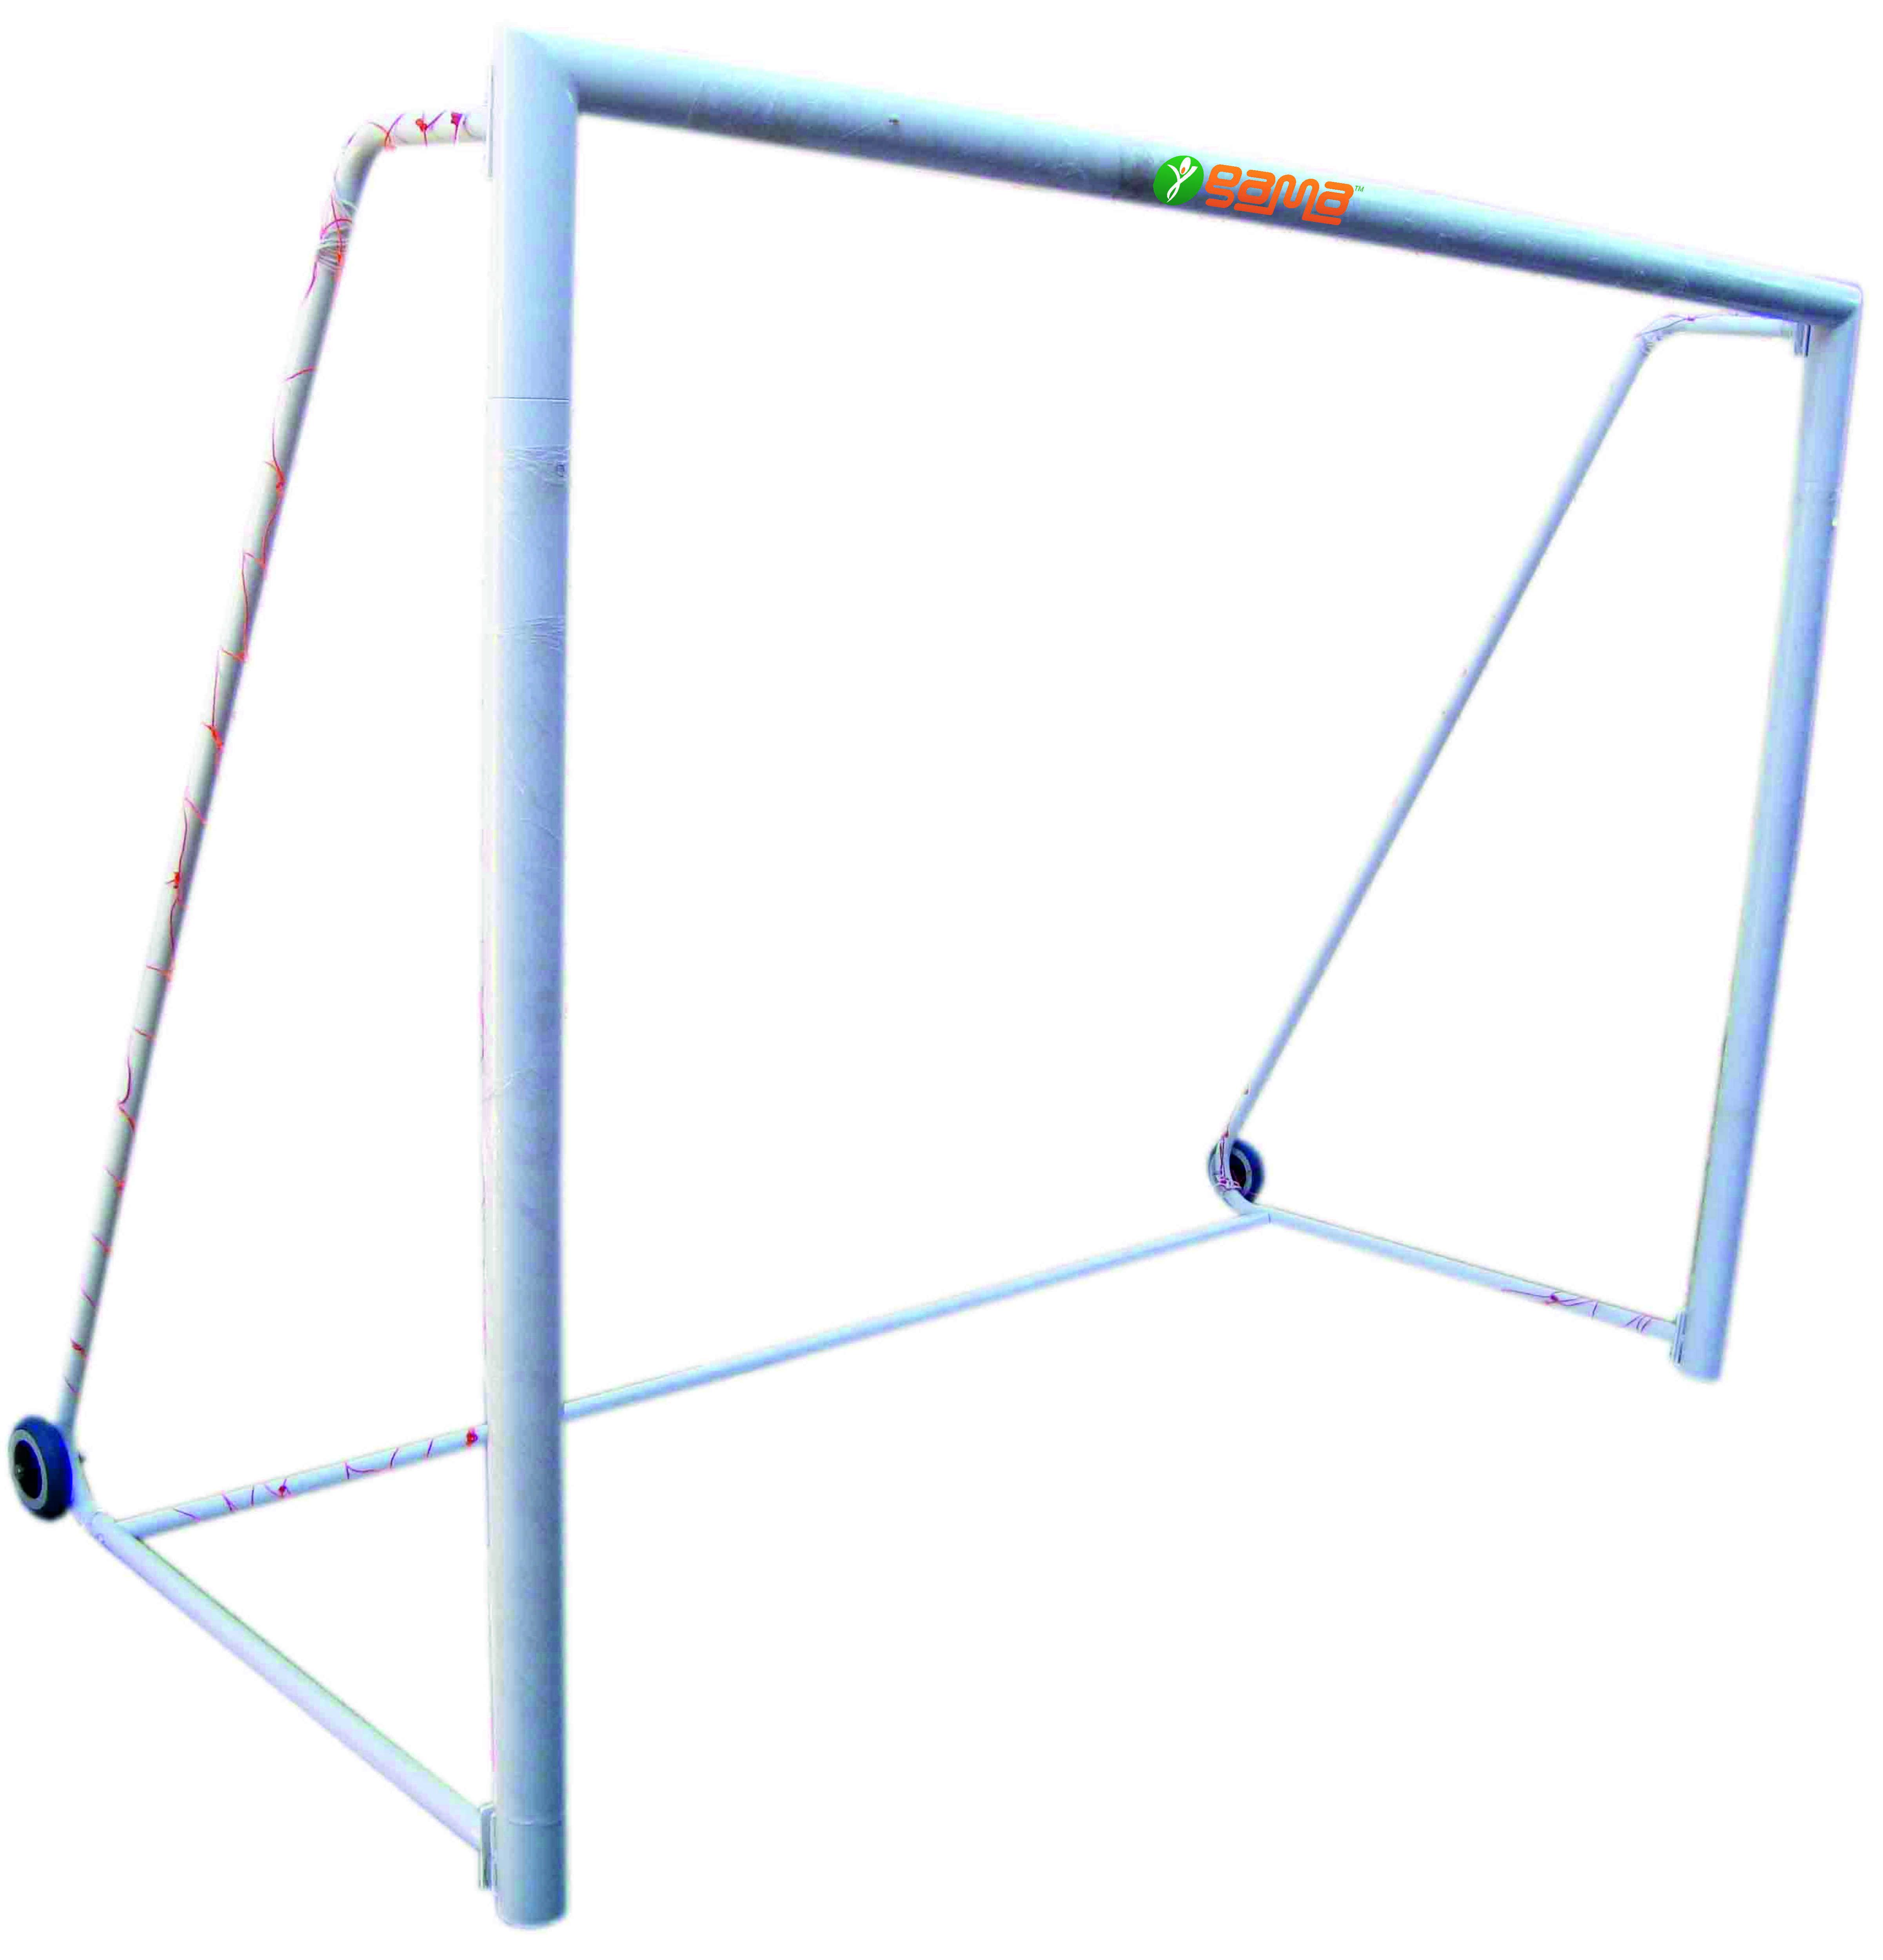 7 A Side Football Goal Post